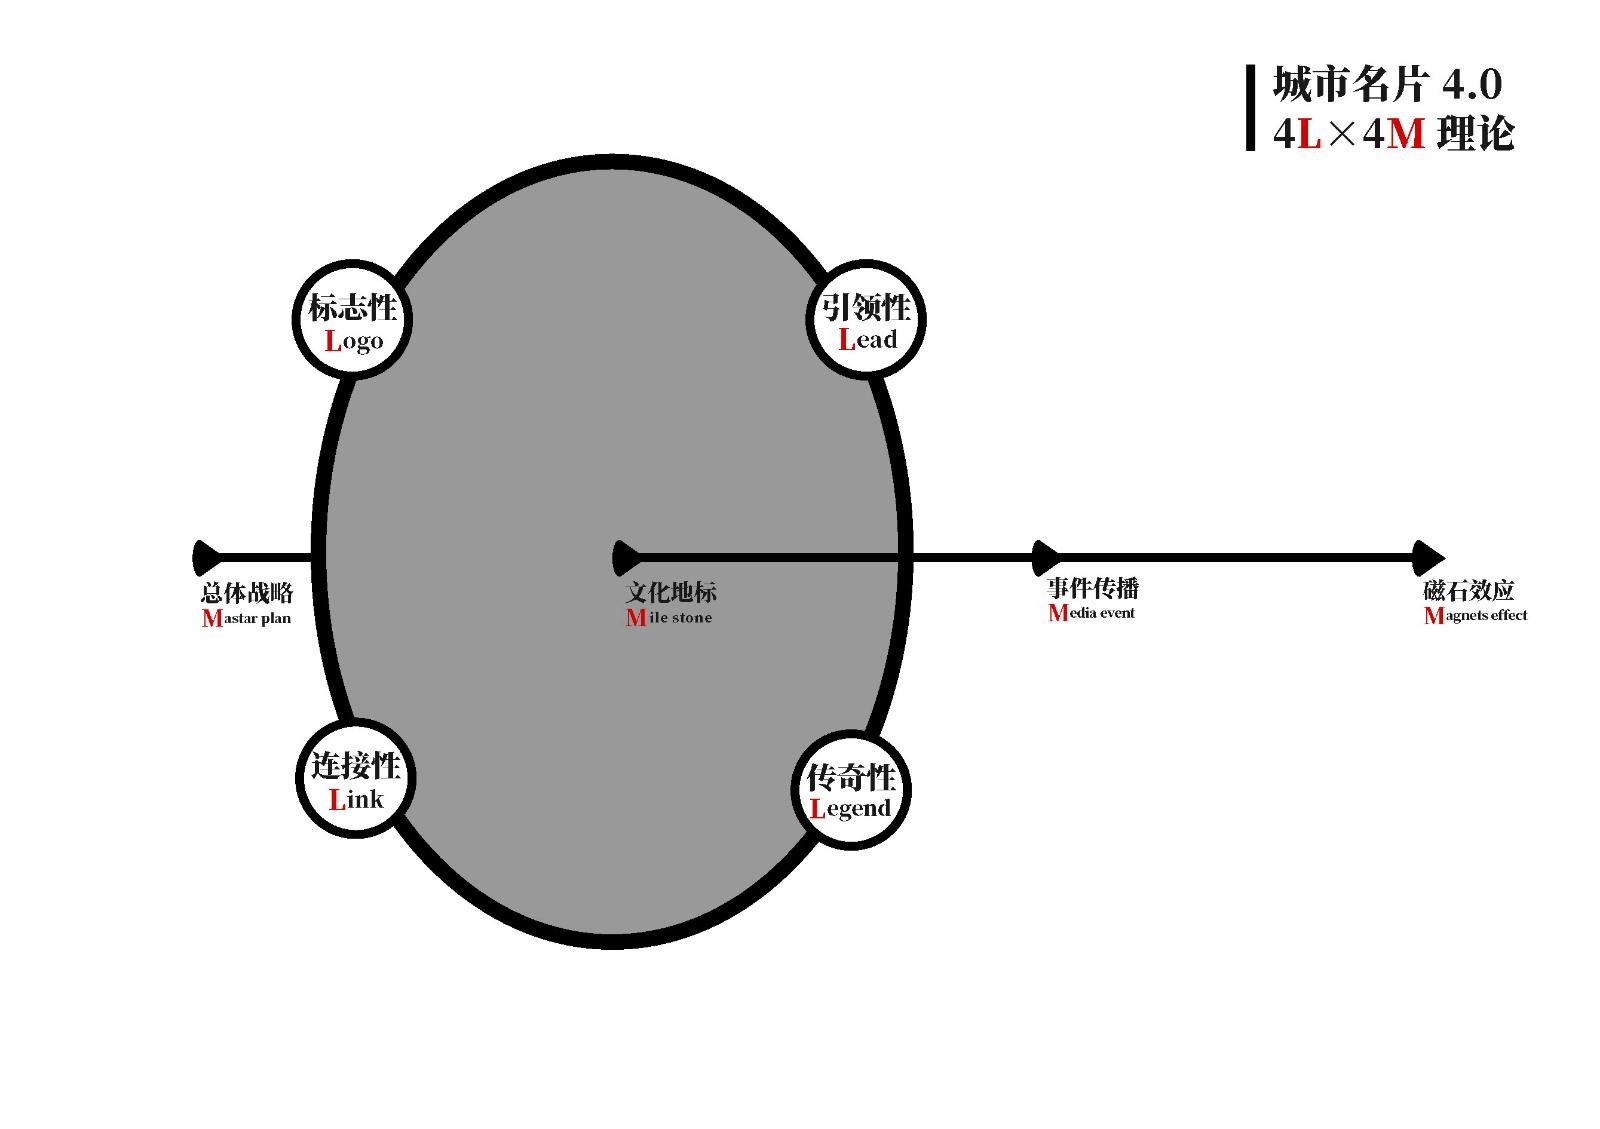 4L×4M理论